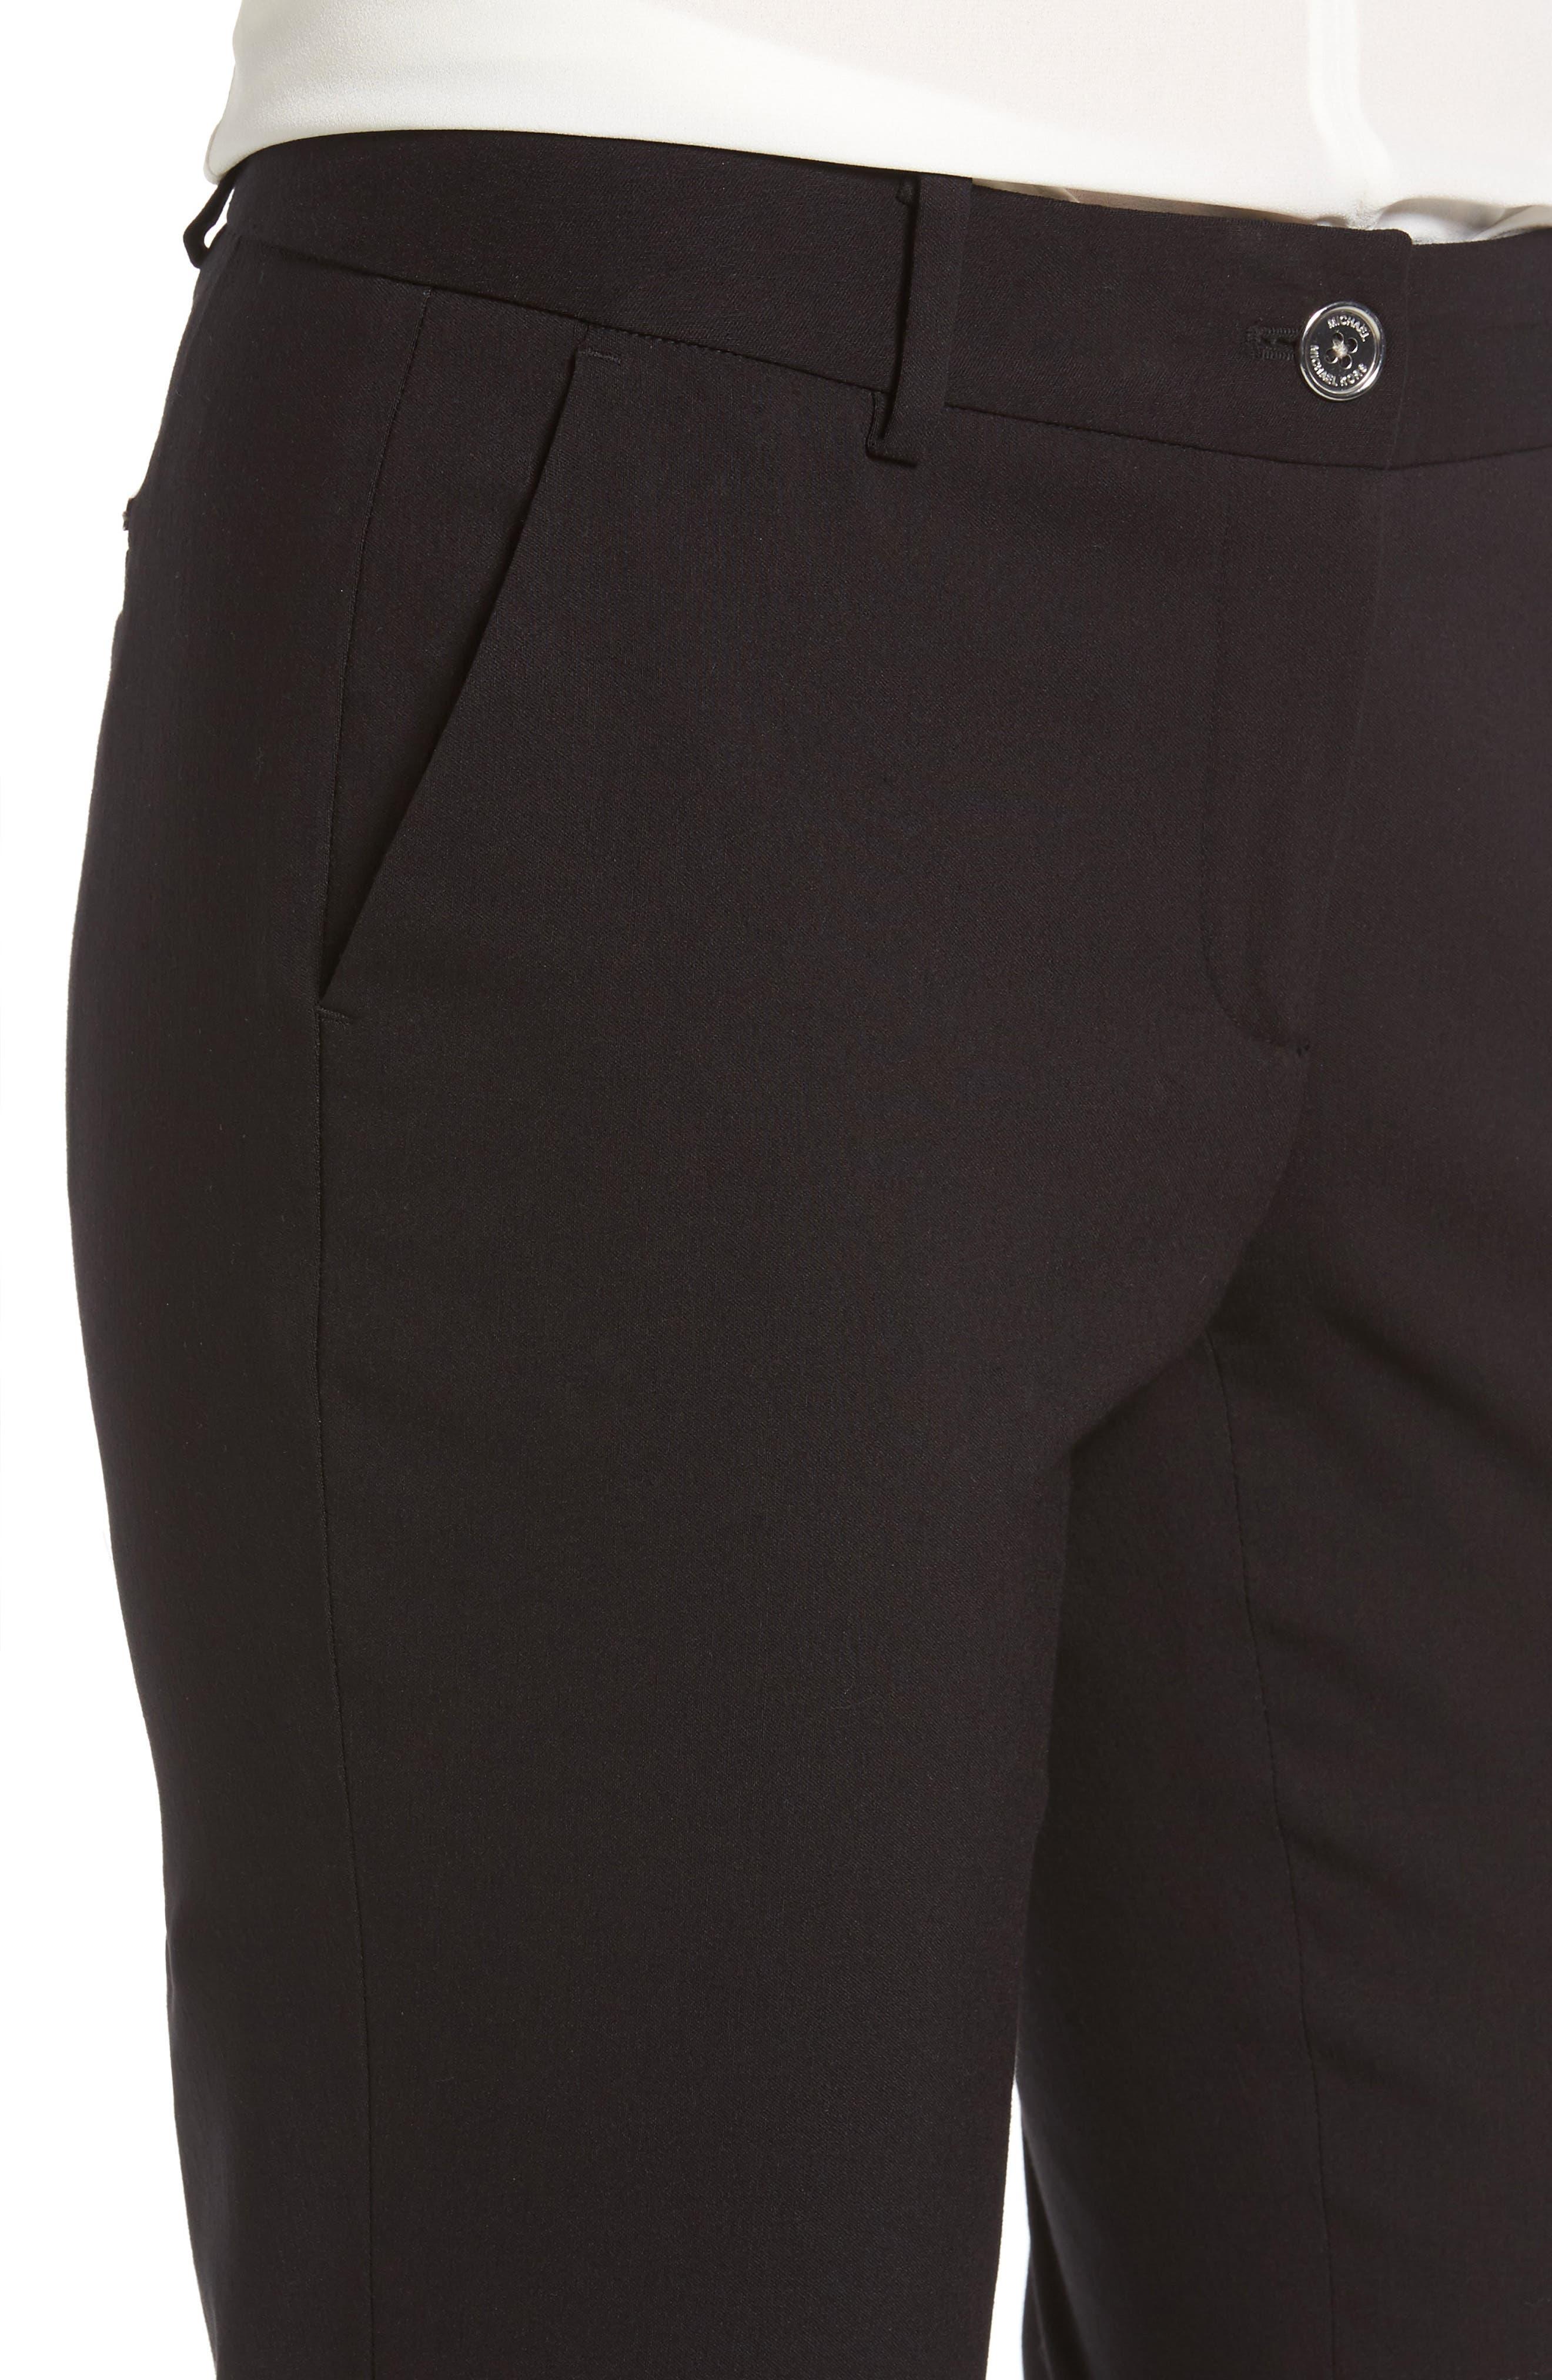 Miranda Slim Ankle Pants,                             Alternate thumbnail 4, color,                             001